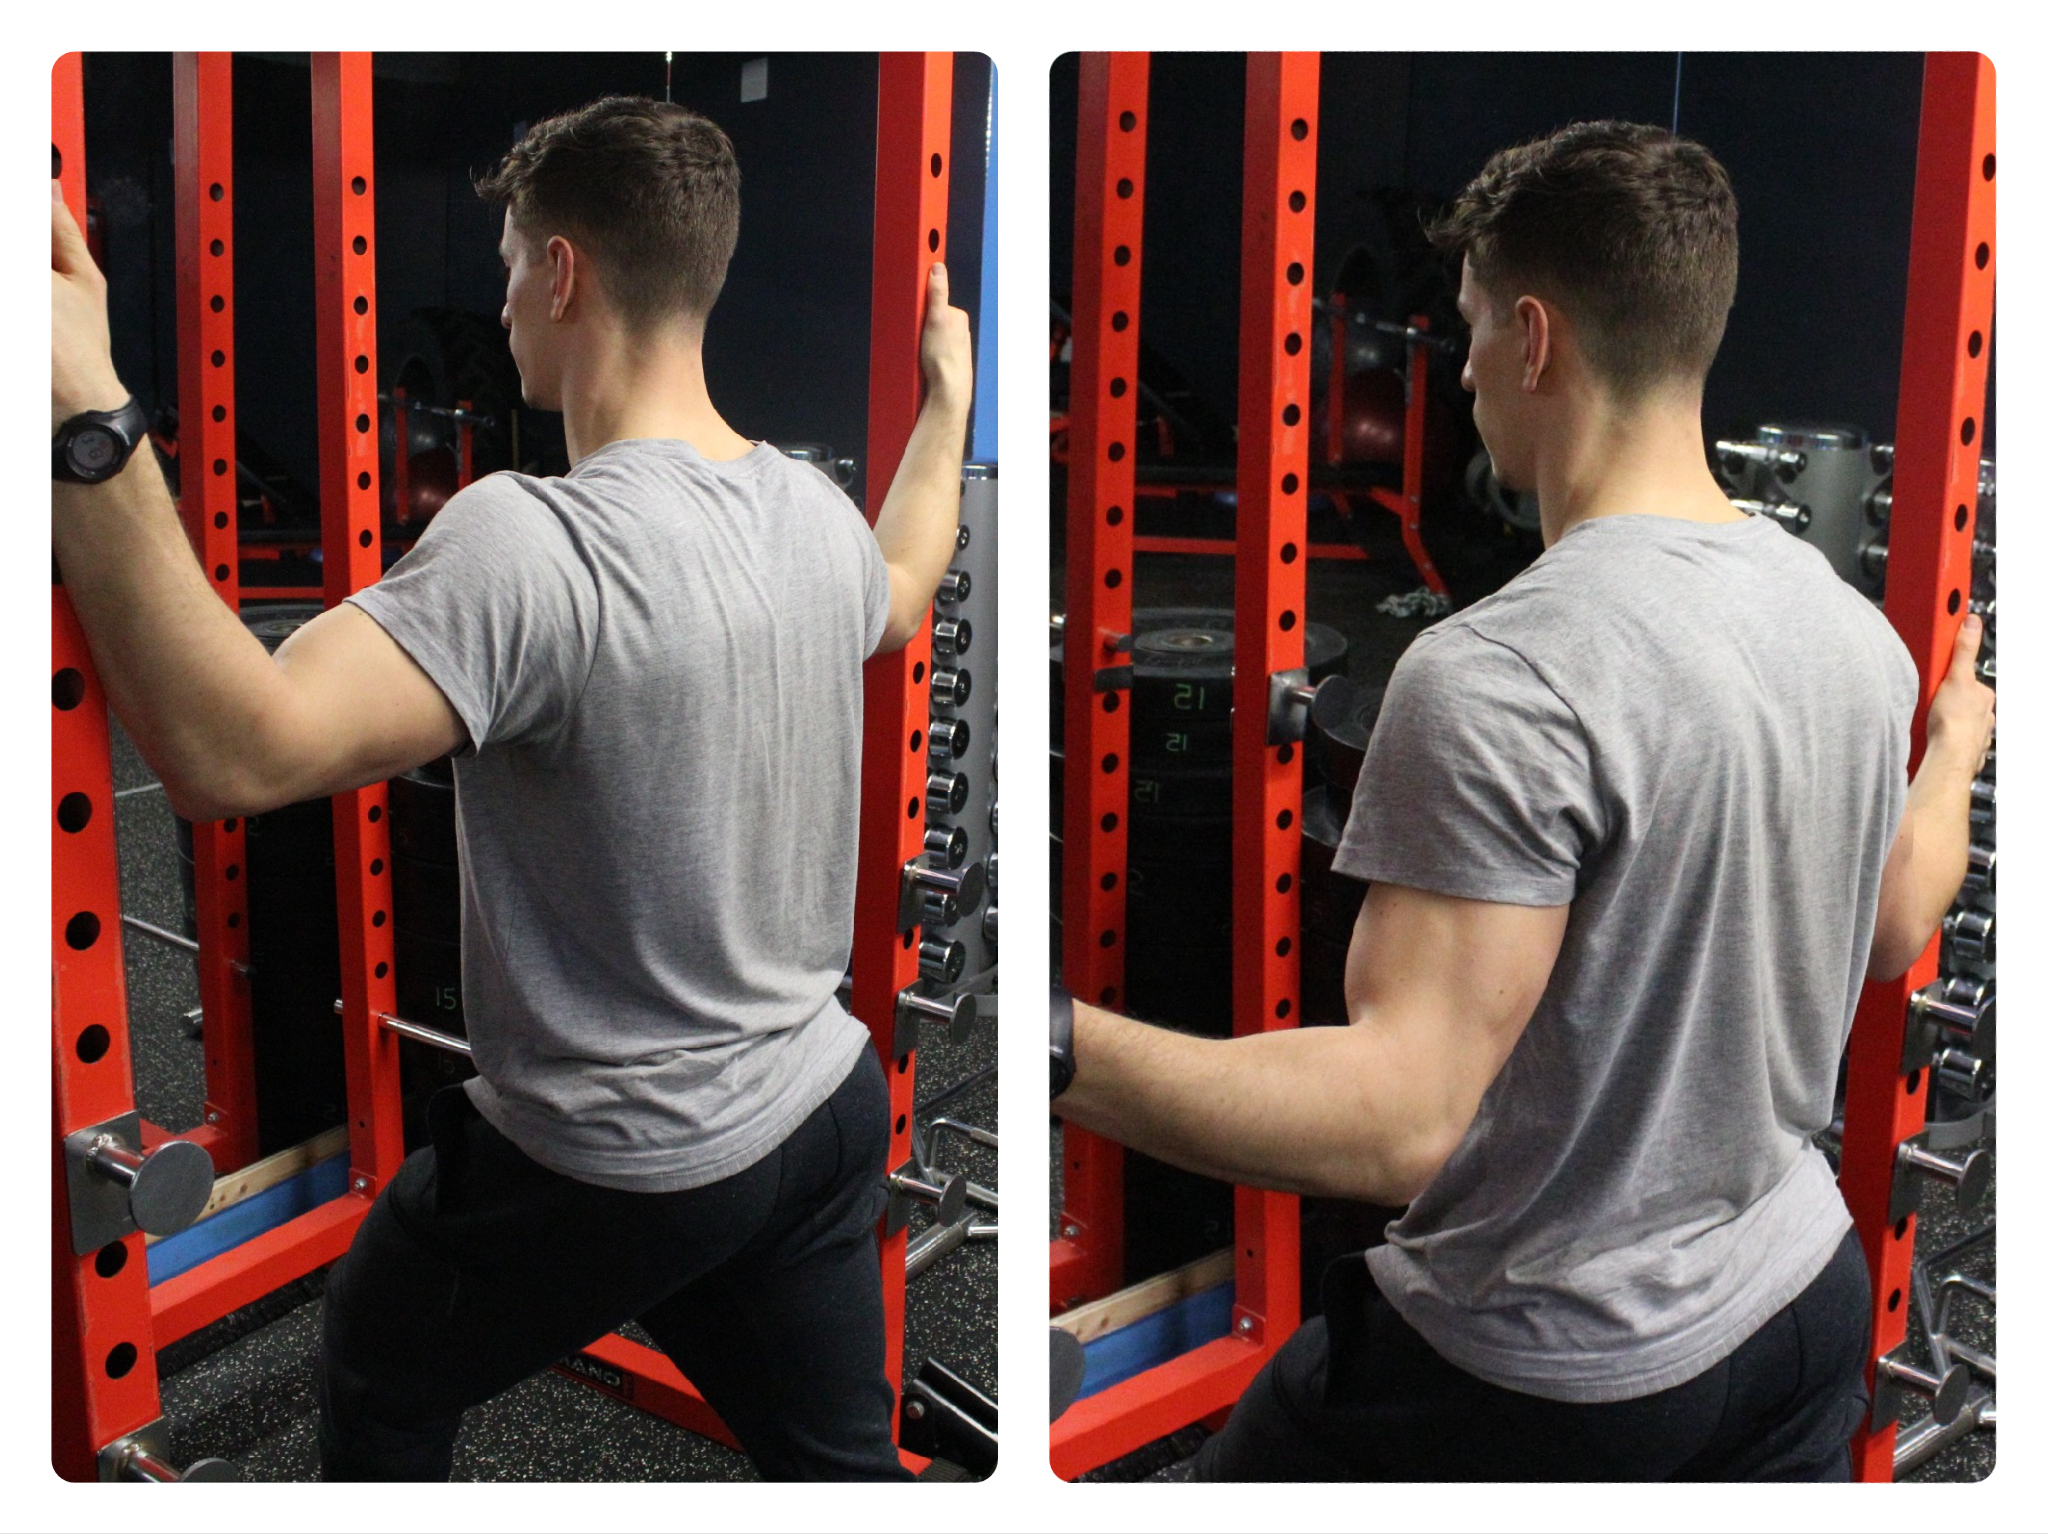 Stretch:  Doorway Chest Stretch  60-90sec/stretch 3 sets/day 7 Days/week